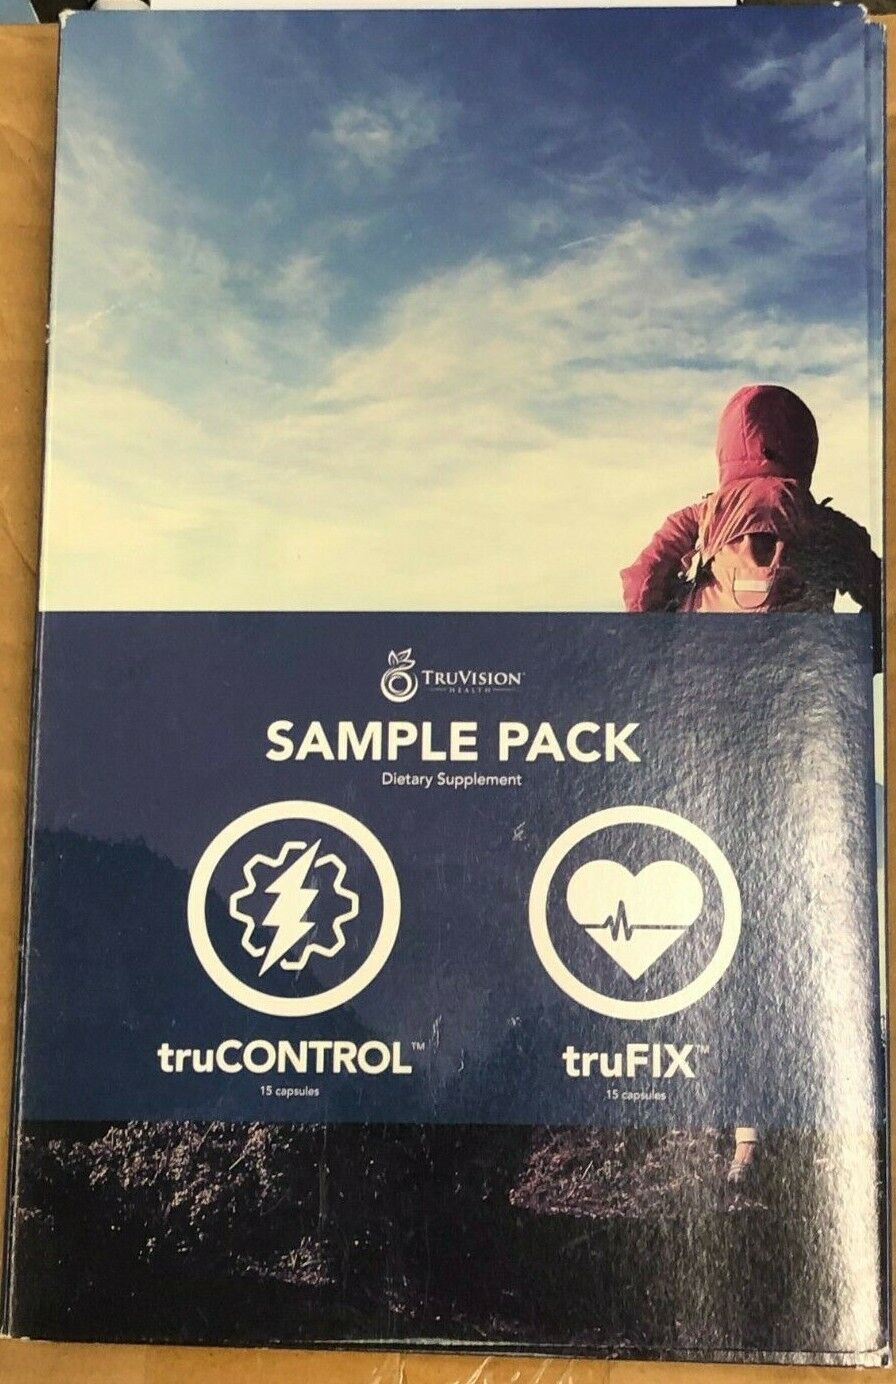 """TruVision Health Weightloss"" 1 WEEK Sample Pack truFIX-truCONTROL"